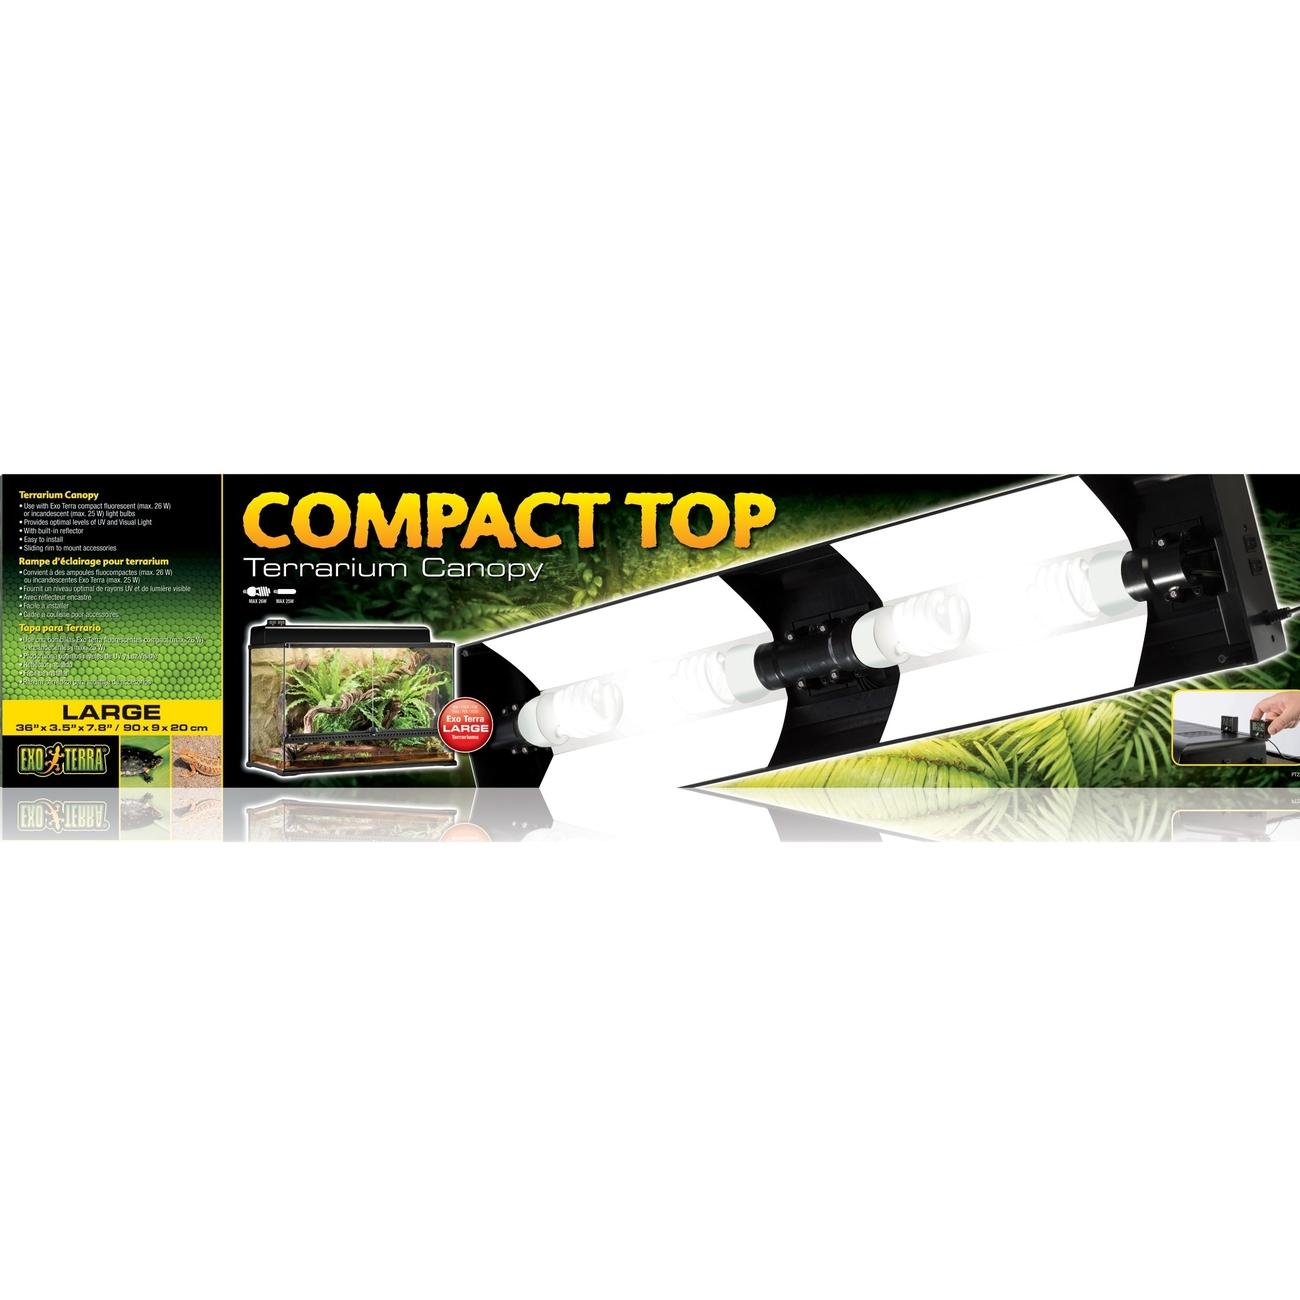 Exo Terra Compact Top - Abdeckung für Terrarienlampen, Bild 5